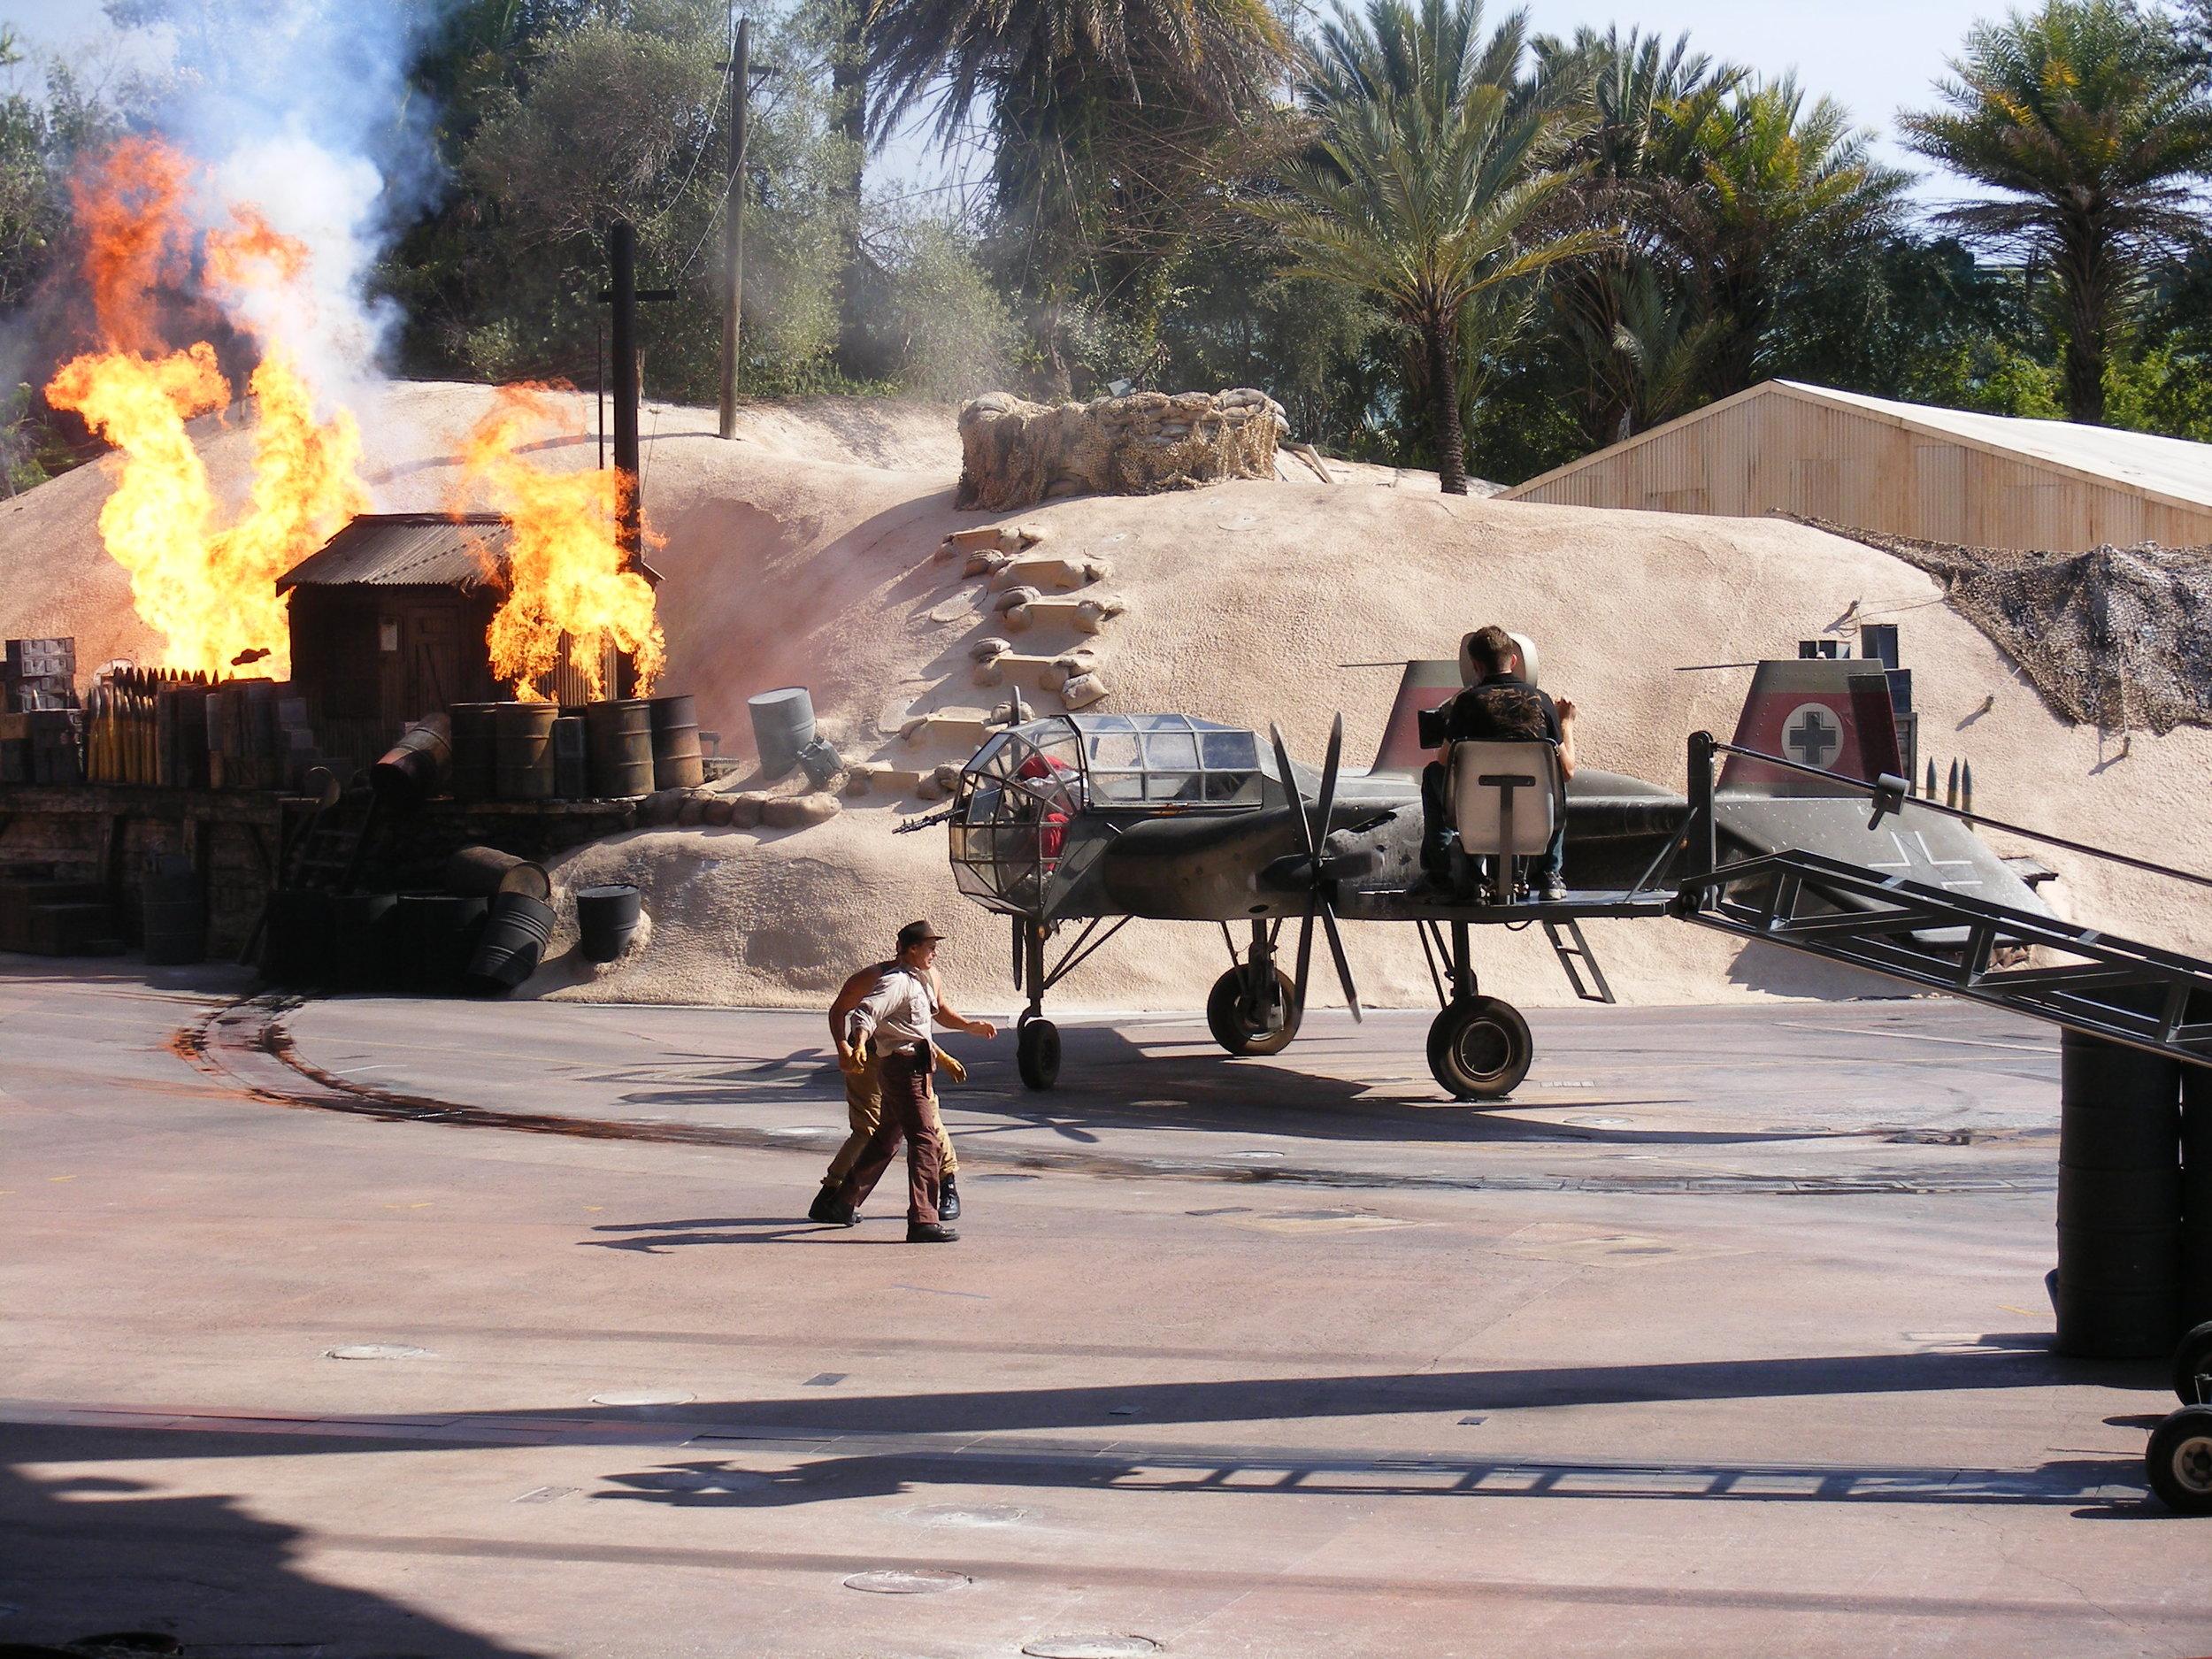 Indiana Jones Epic Stunt Spectacular, Echo Lake, DIsney's Hollywood Studios